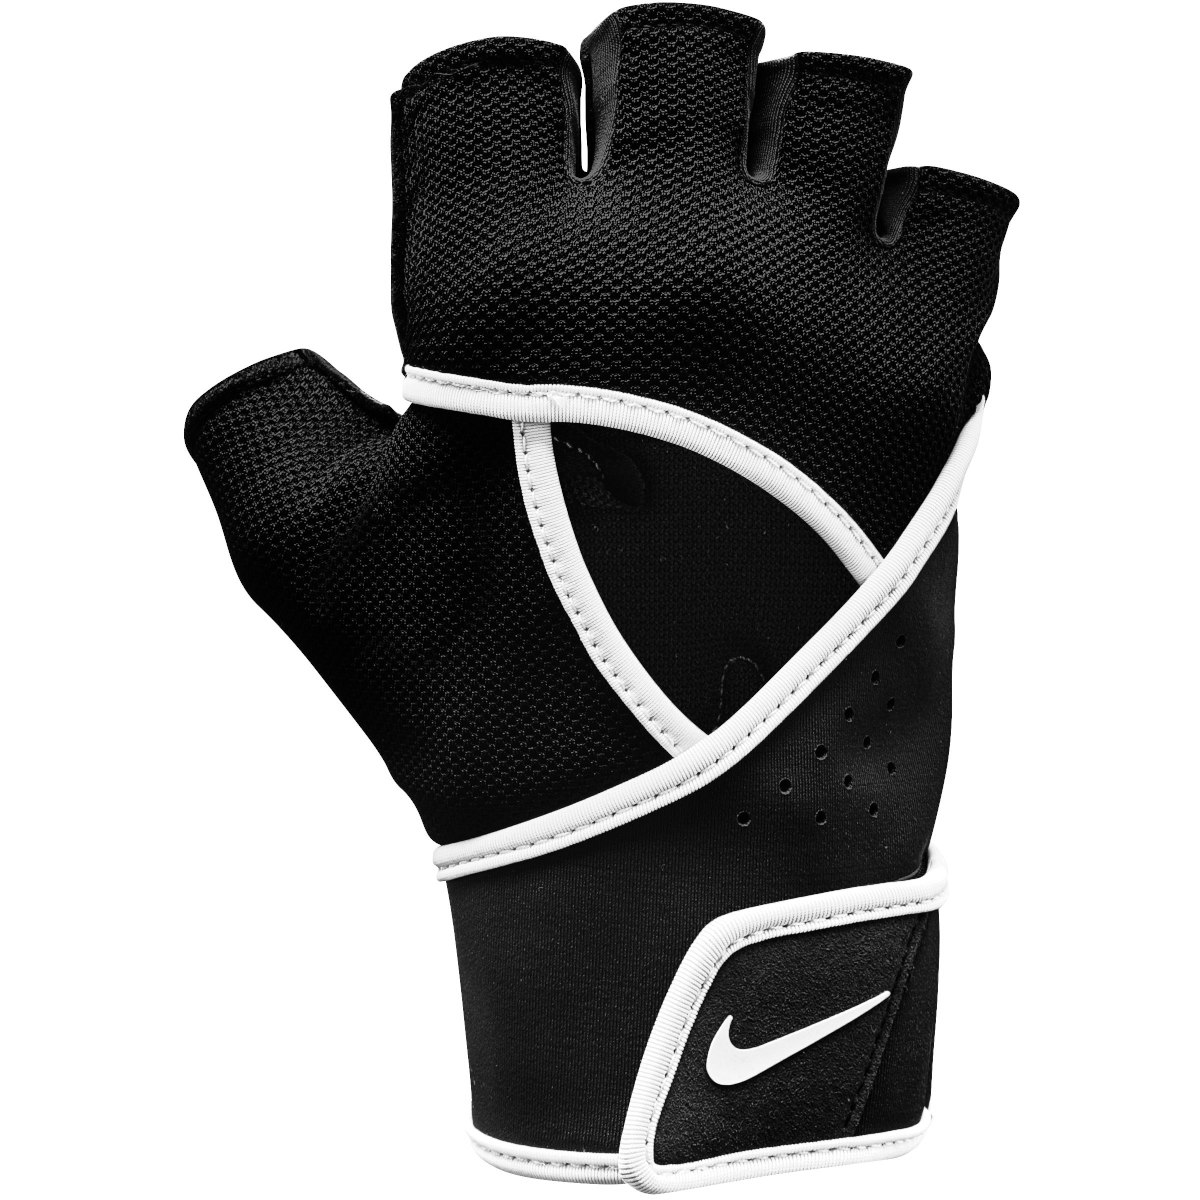 Foto de Nike Gym Premium Fitness Guantes para mujeres - black/white 010